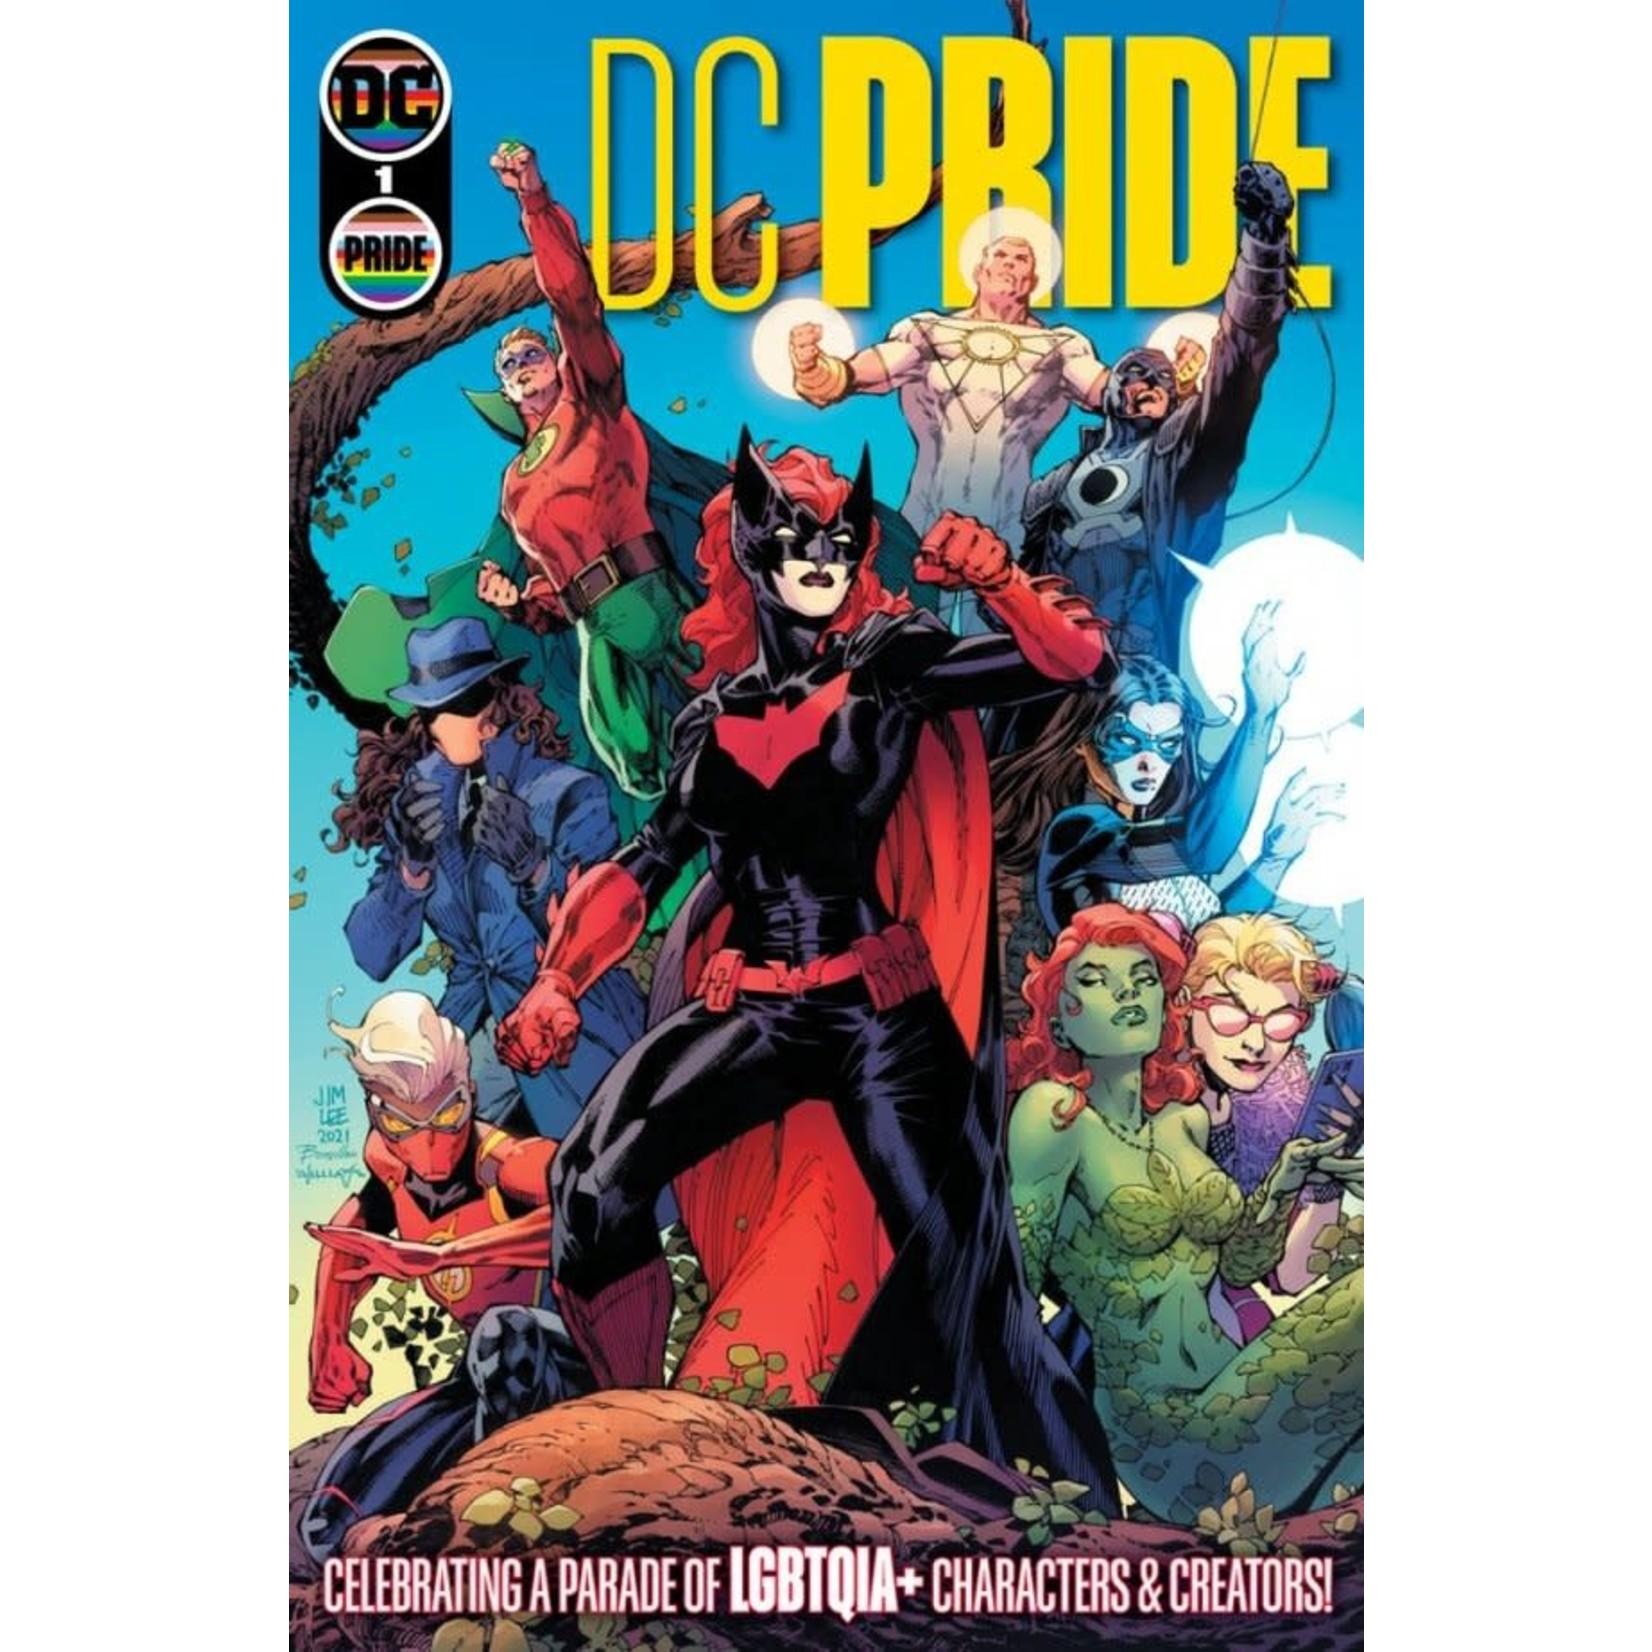 DC Comics DC Pride #1